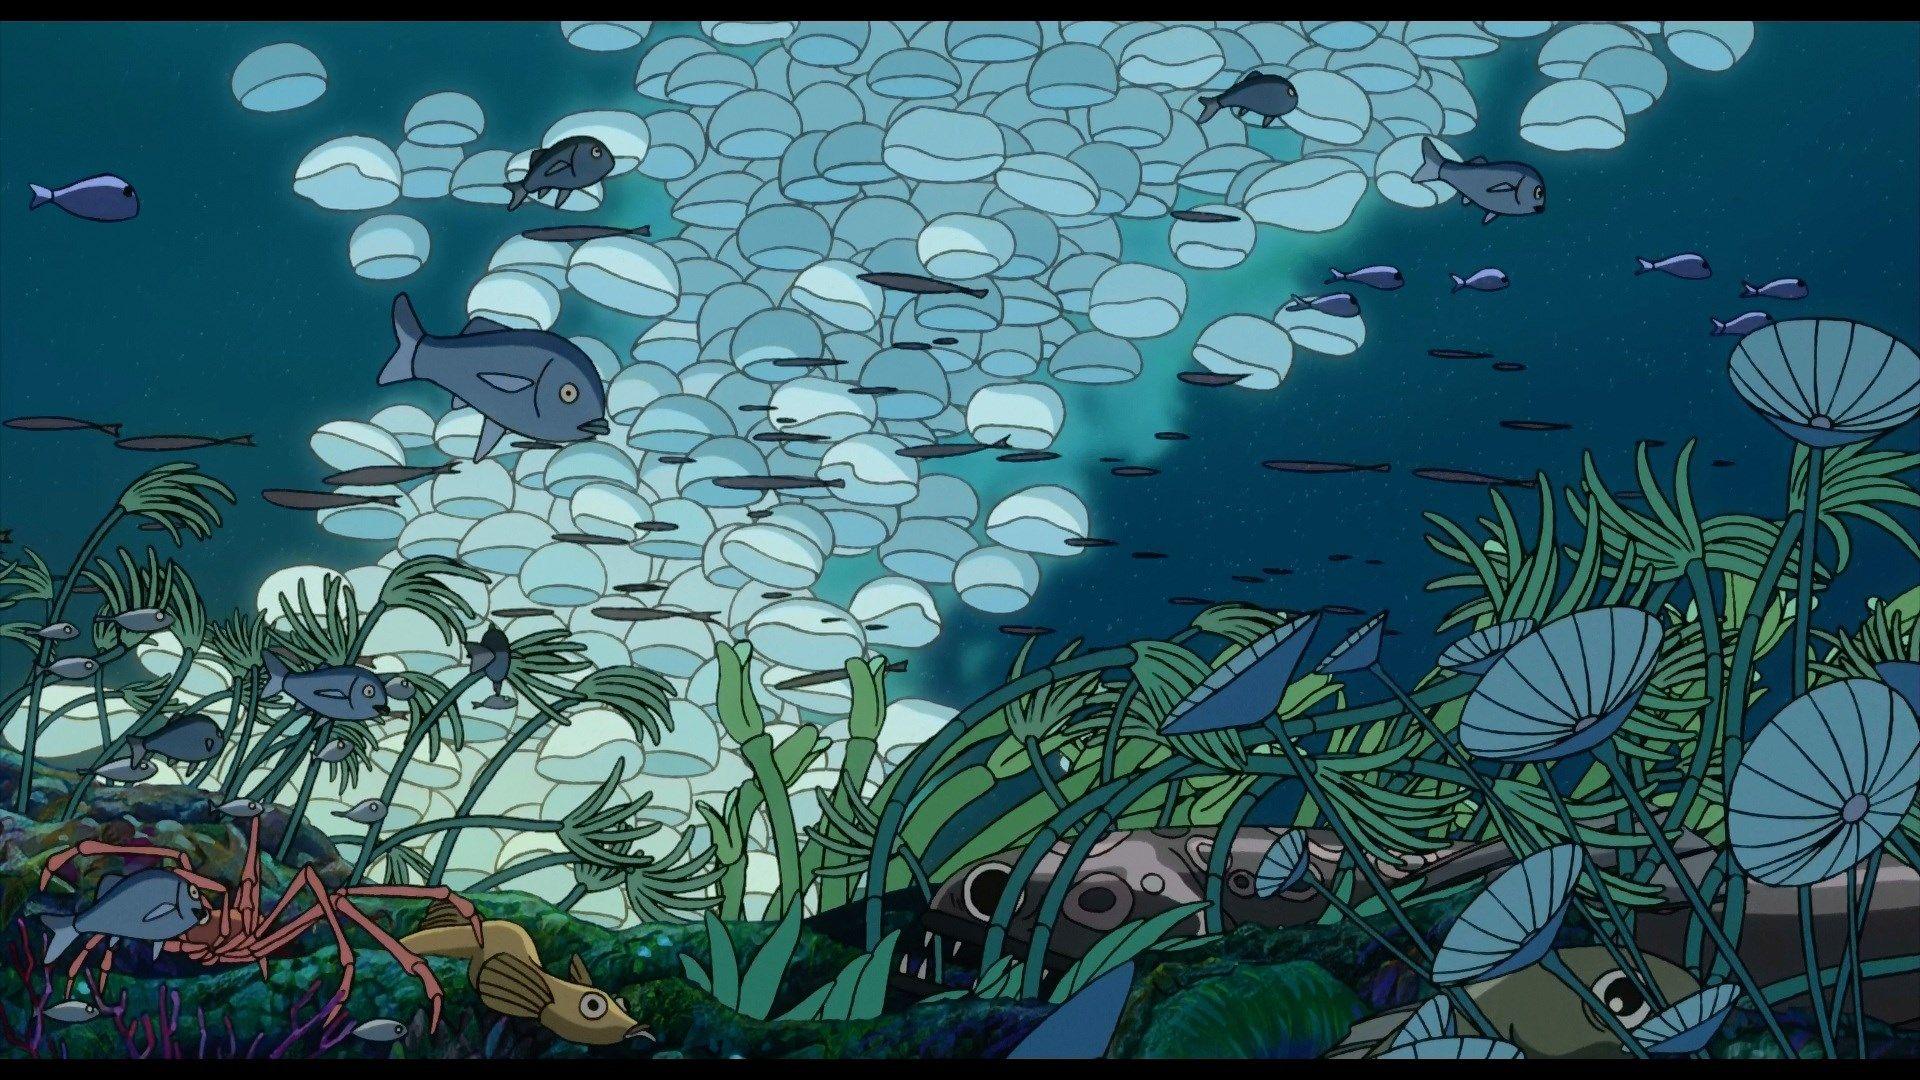 Ponyo Desktop Wallpaper Posted By Ryan Peltier